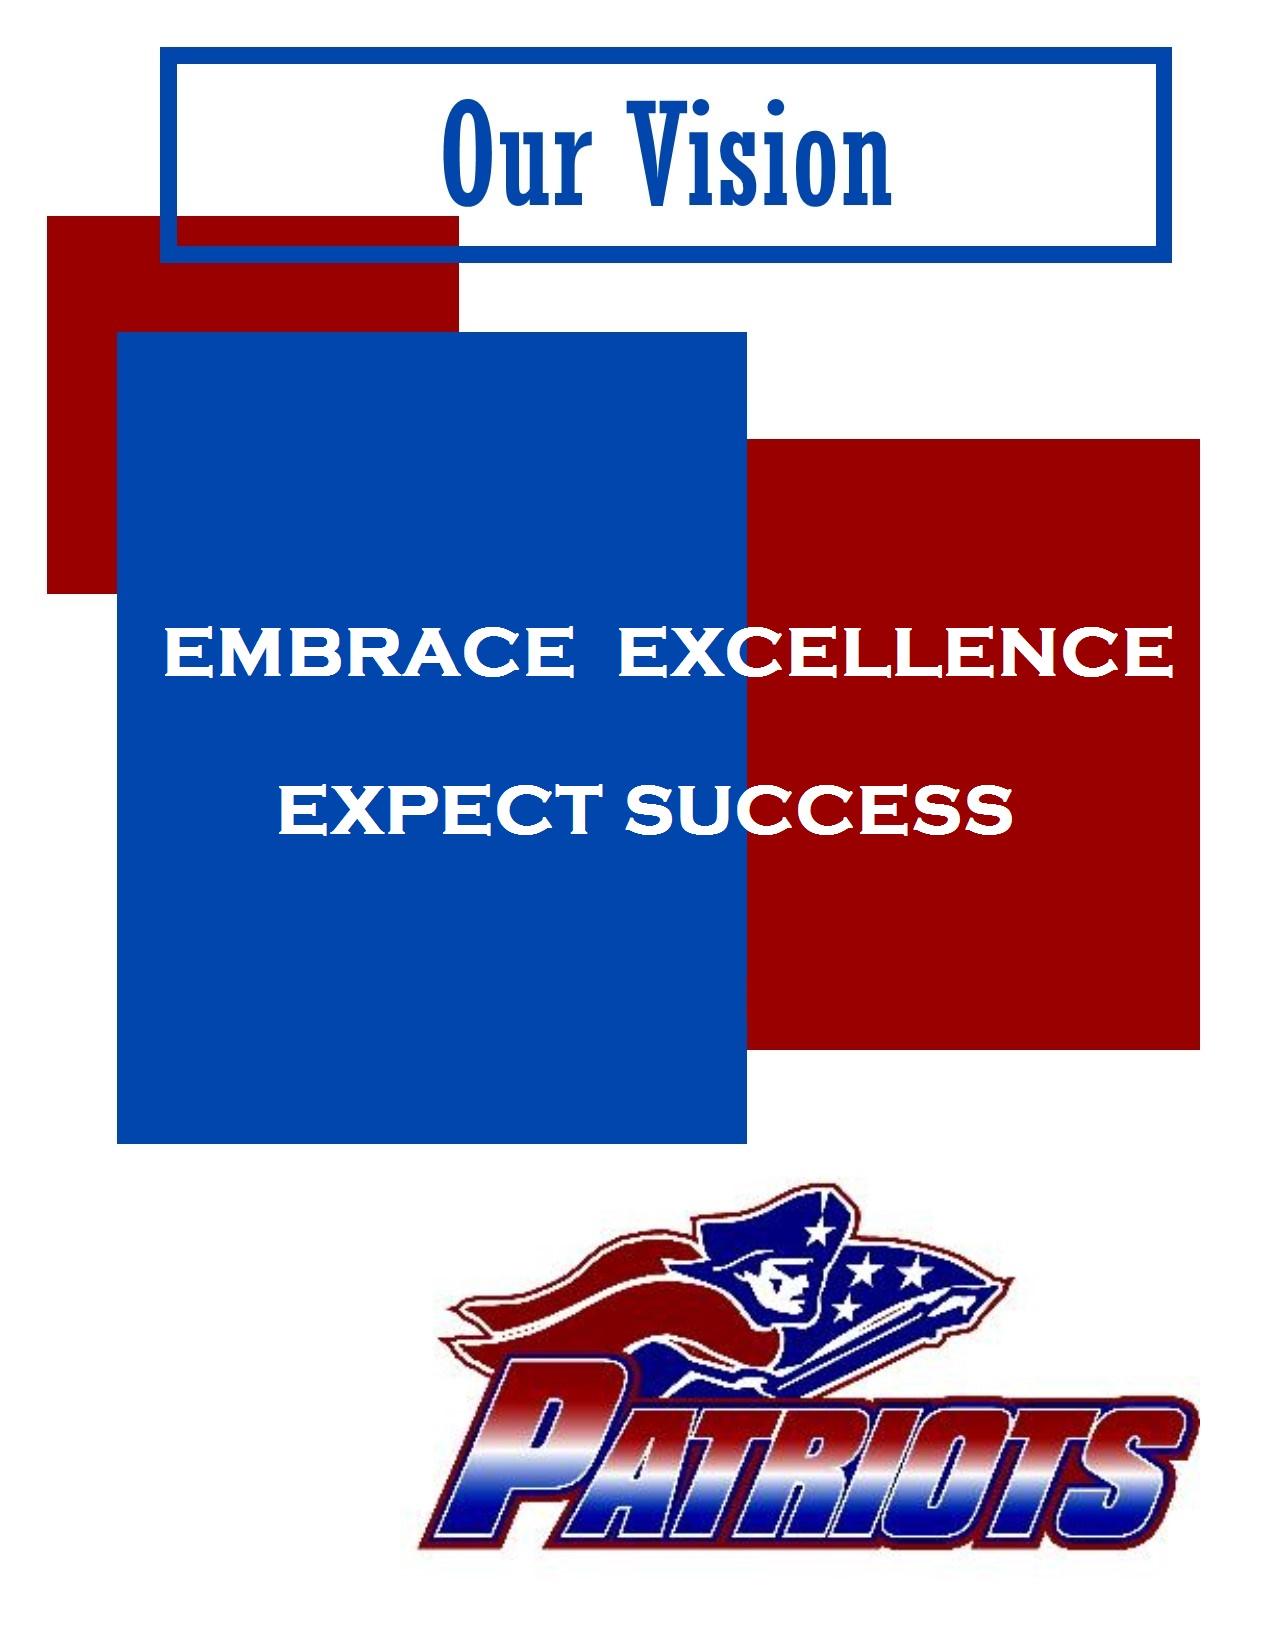 Our Vision, Embrace Excellence Expect Success, Patriots